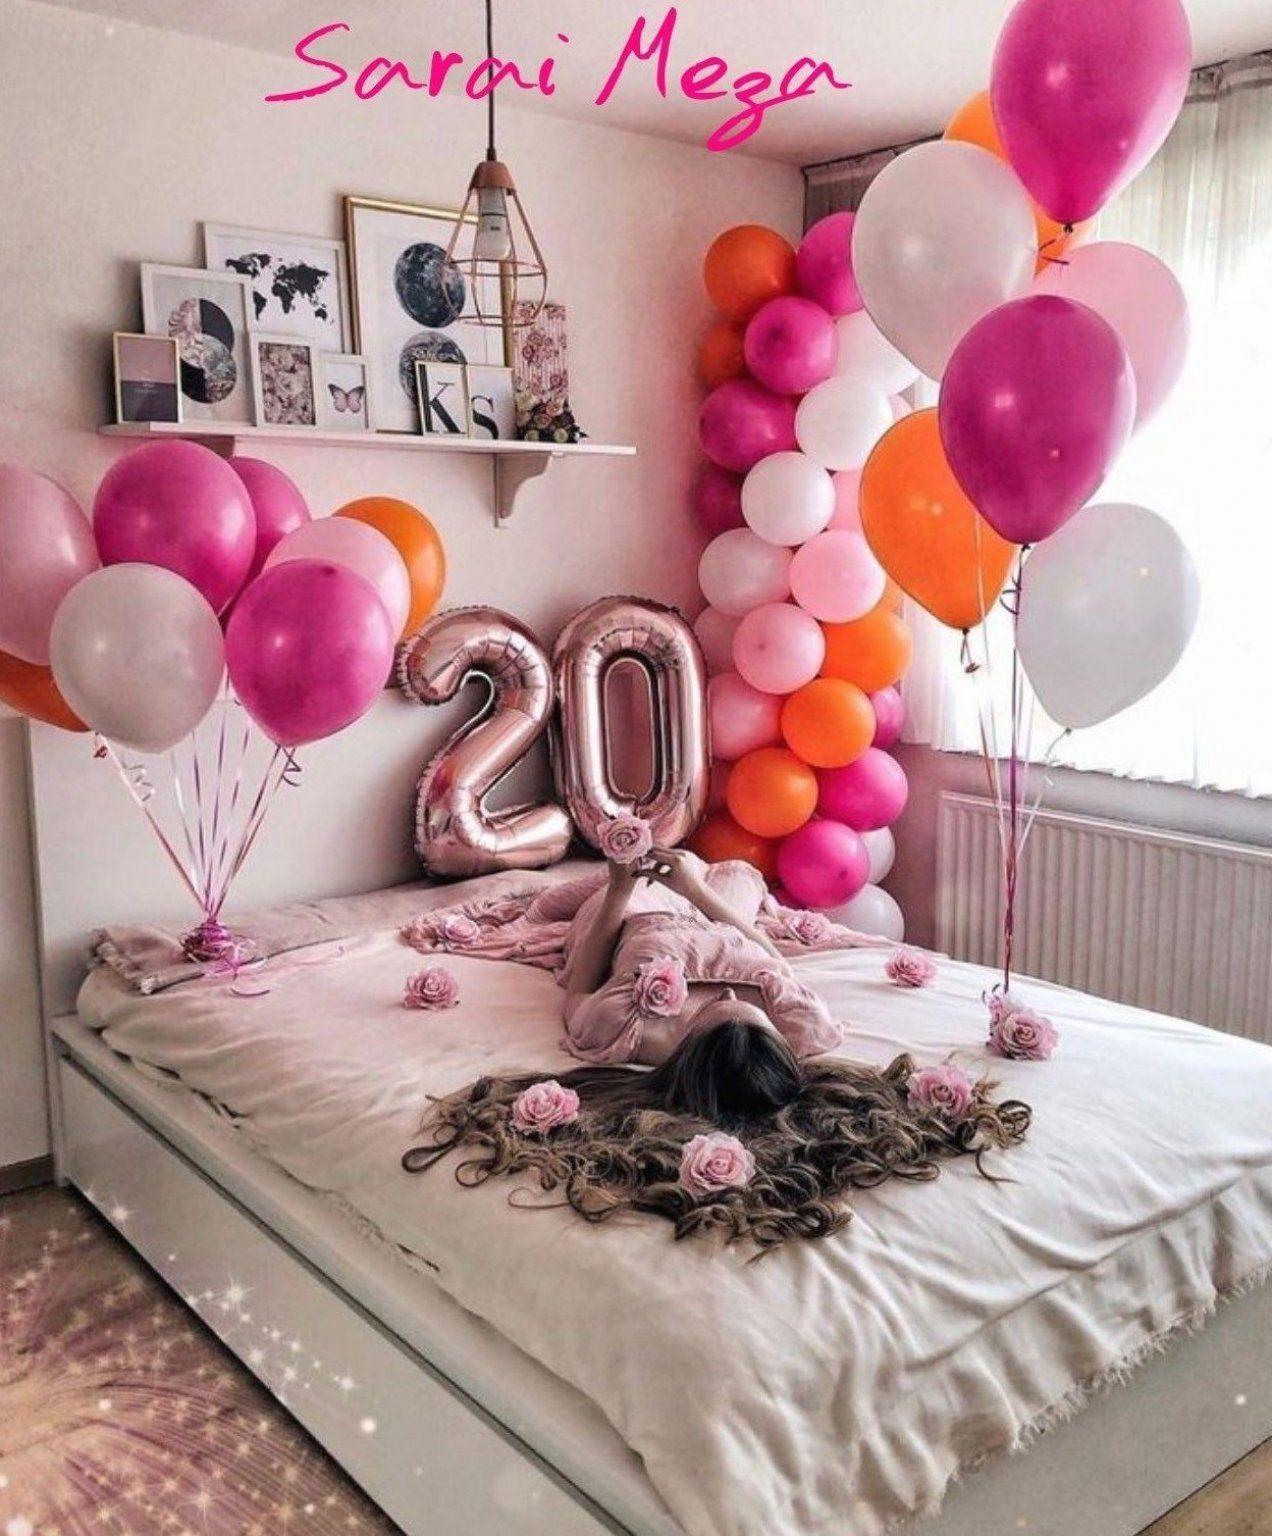 Homedecor Birthday Room Decorations Birthday Balloon Decorations 21st Birthday Decorations